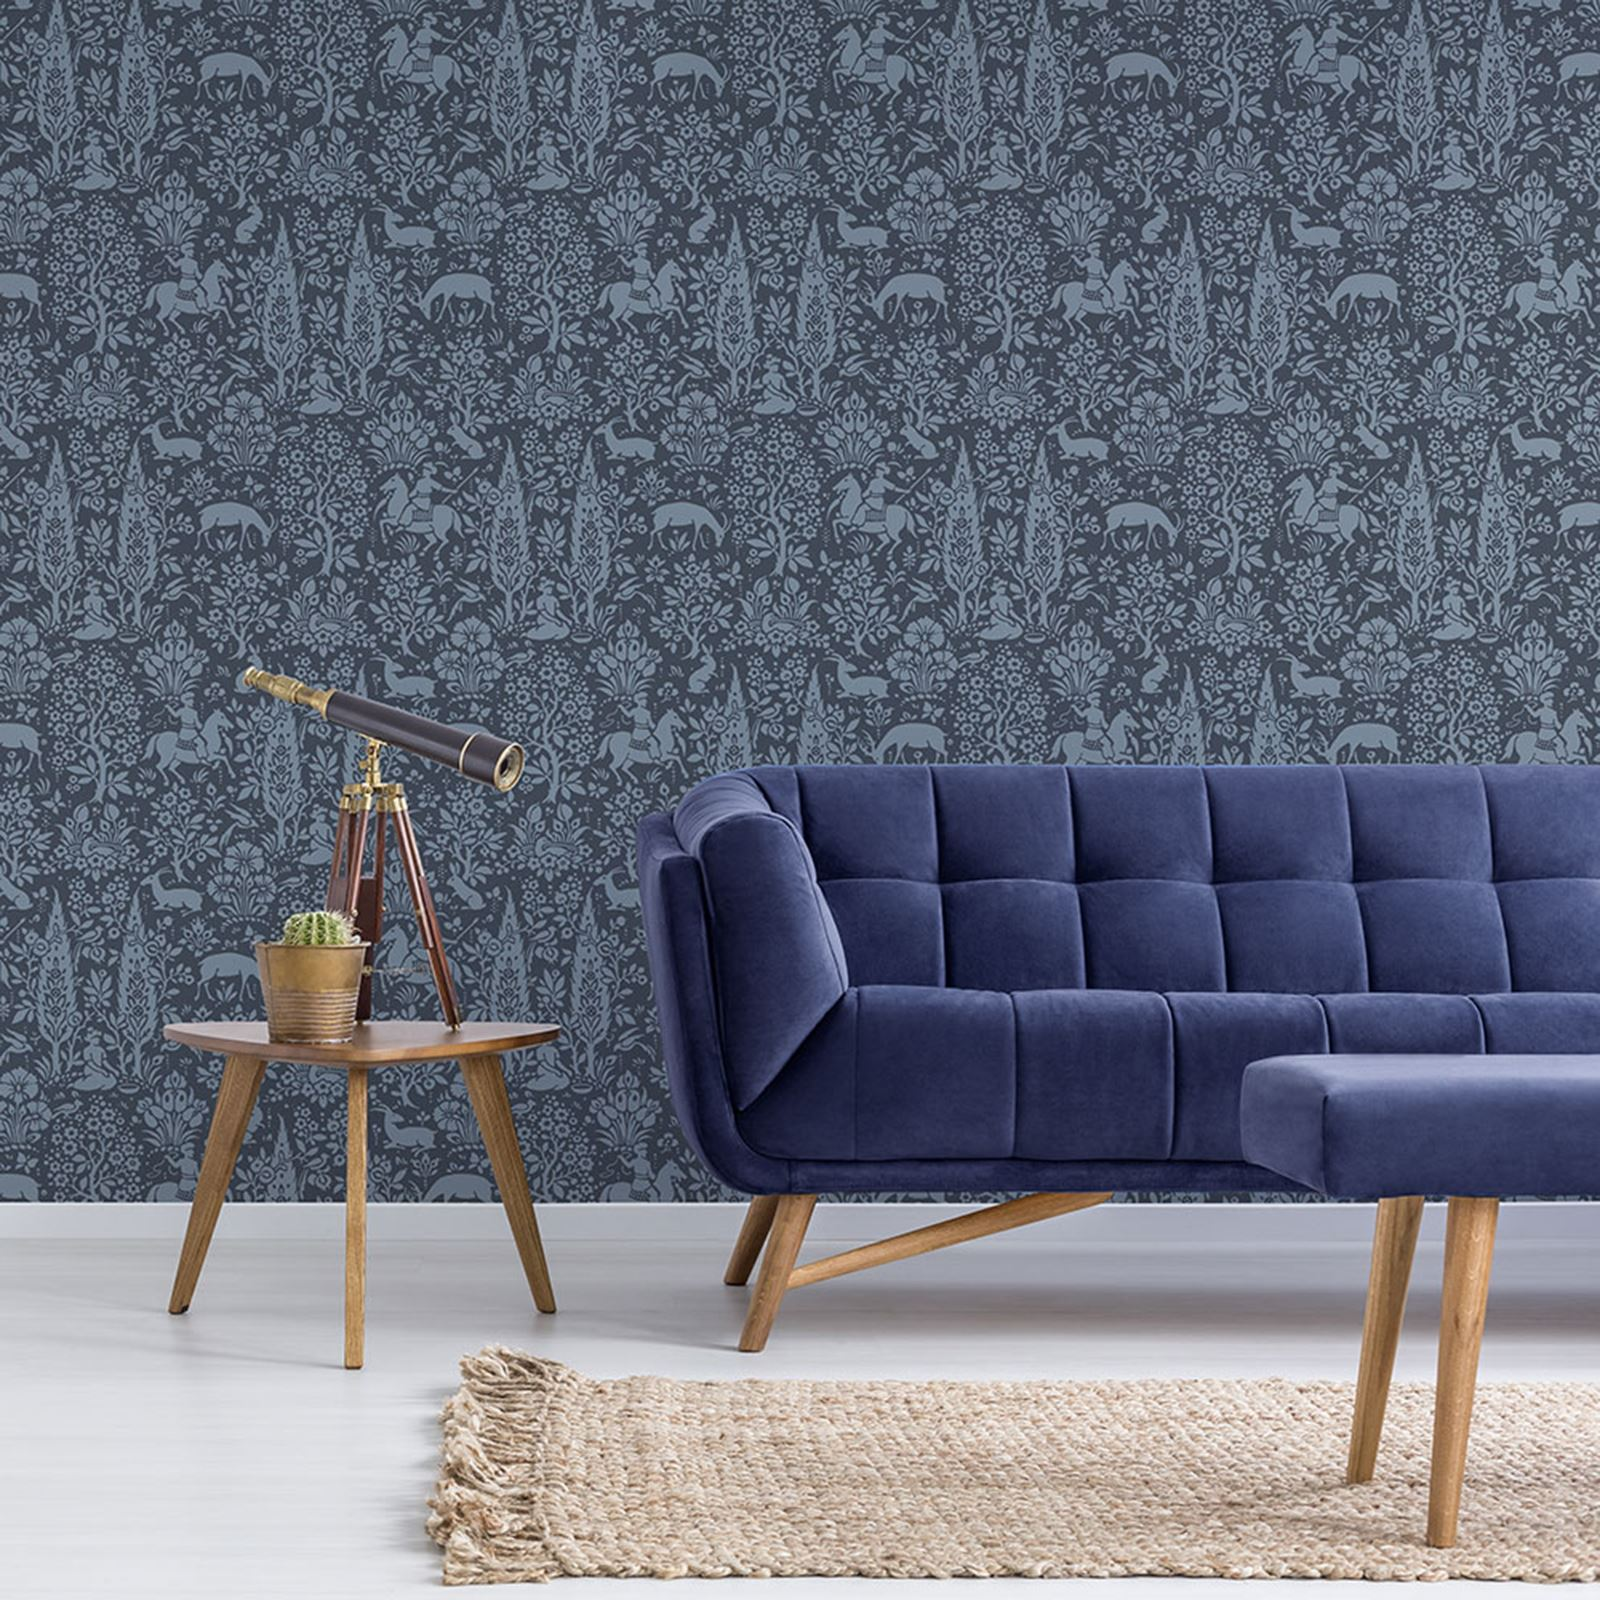 archive wald tapete dunkelblau krone m1169 blumenmuster. Black Bedroom Furniture Sets. Home Design Ideas